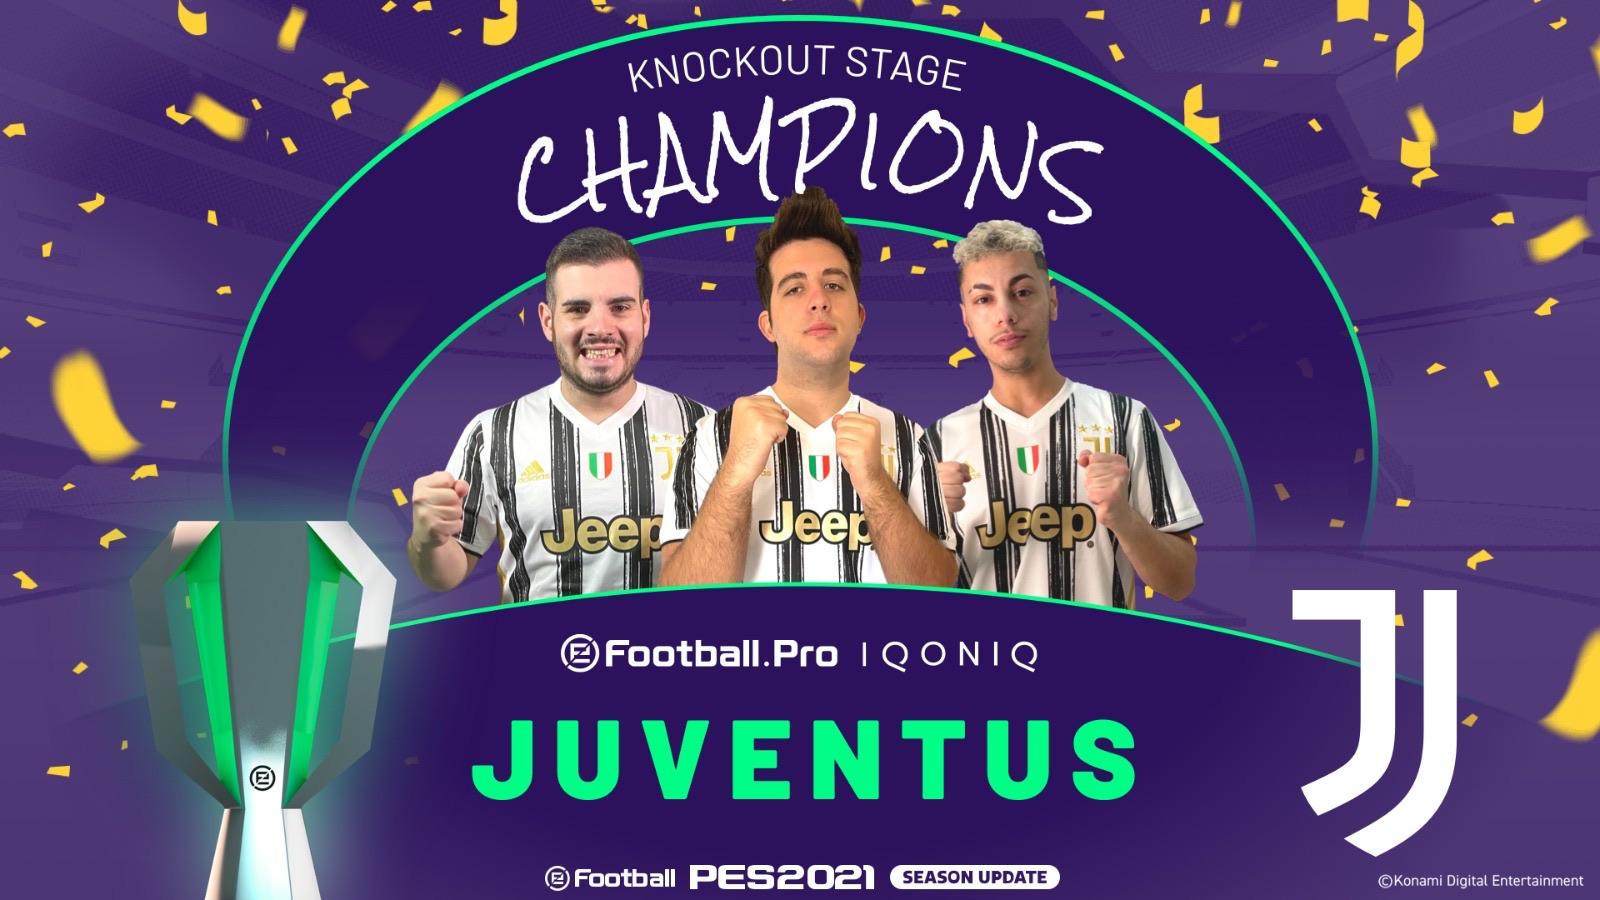 juventus campione d'Europa